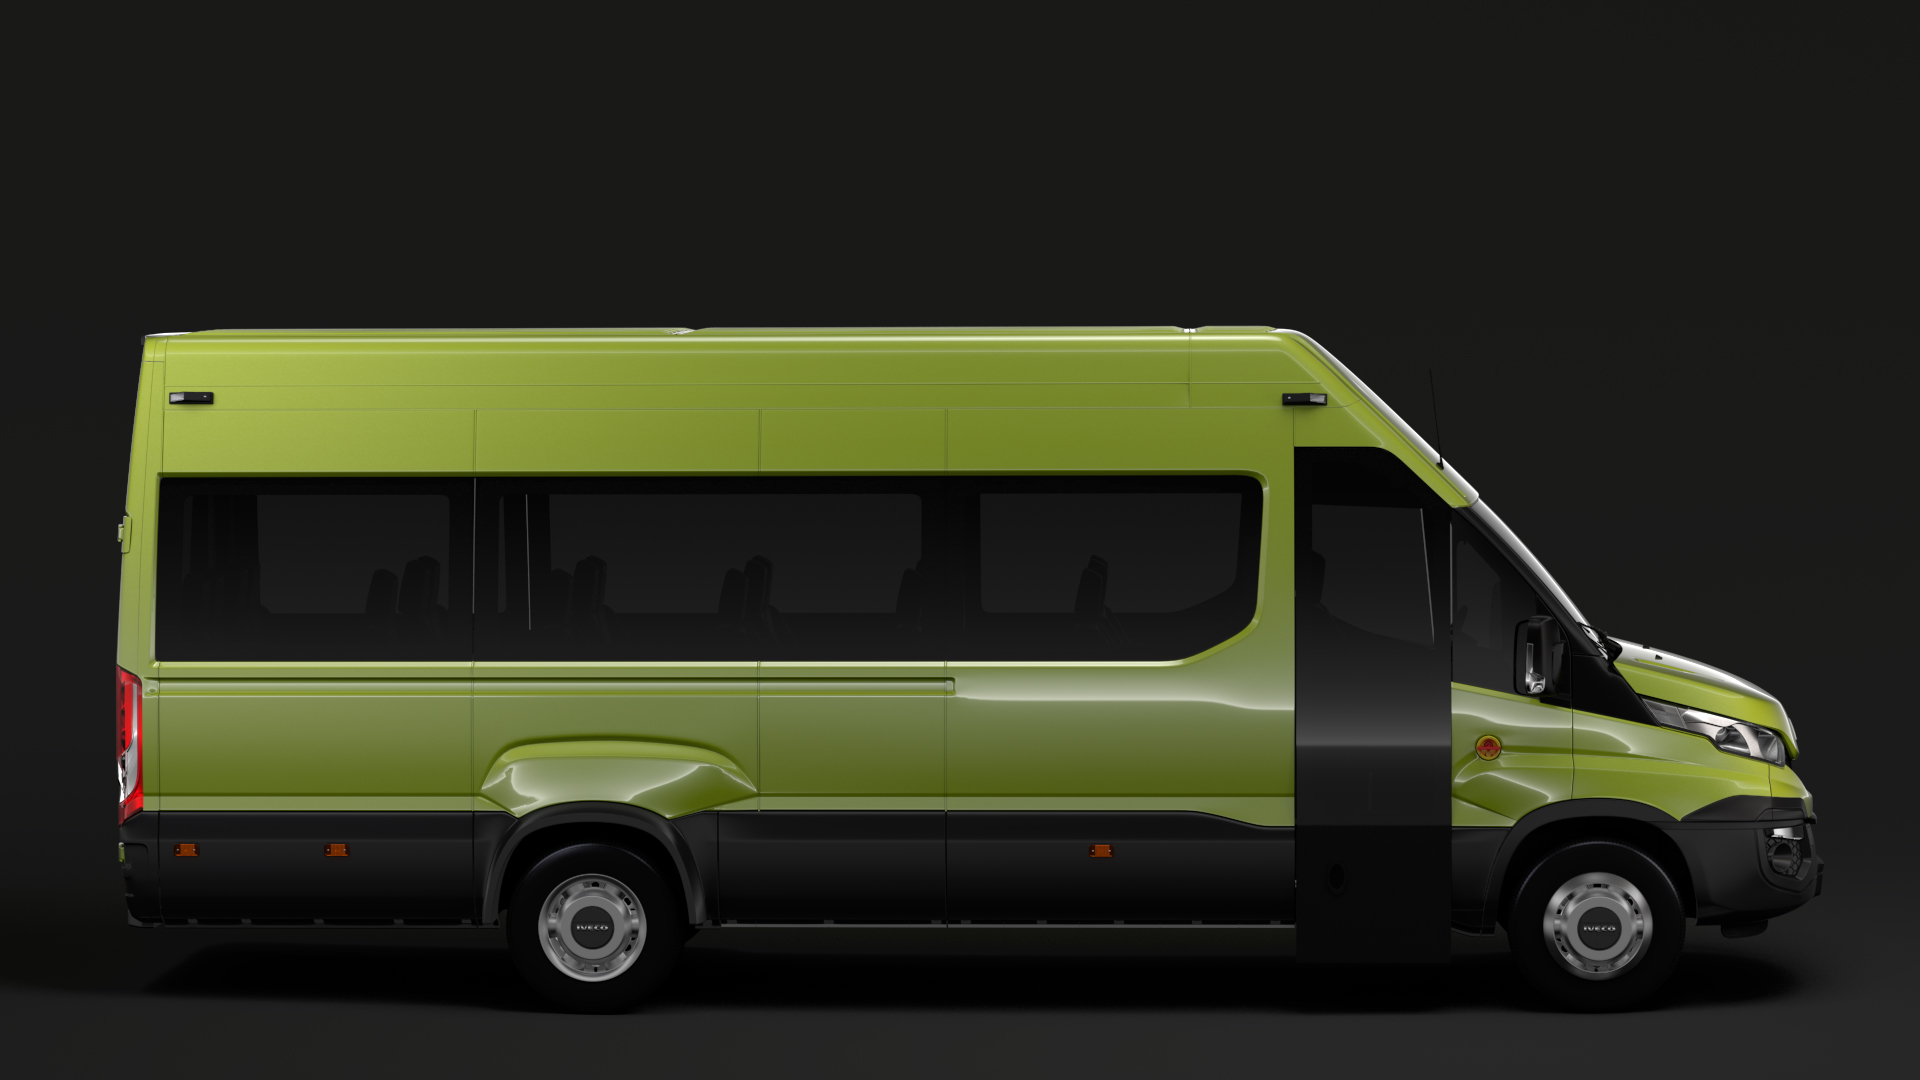 iveco daily tourus l4h3 2014-2016 3d model max fbx c4d lwo ma mb hrc xsi obj 276240